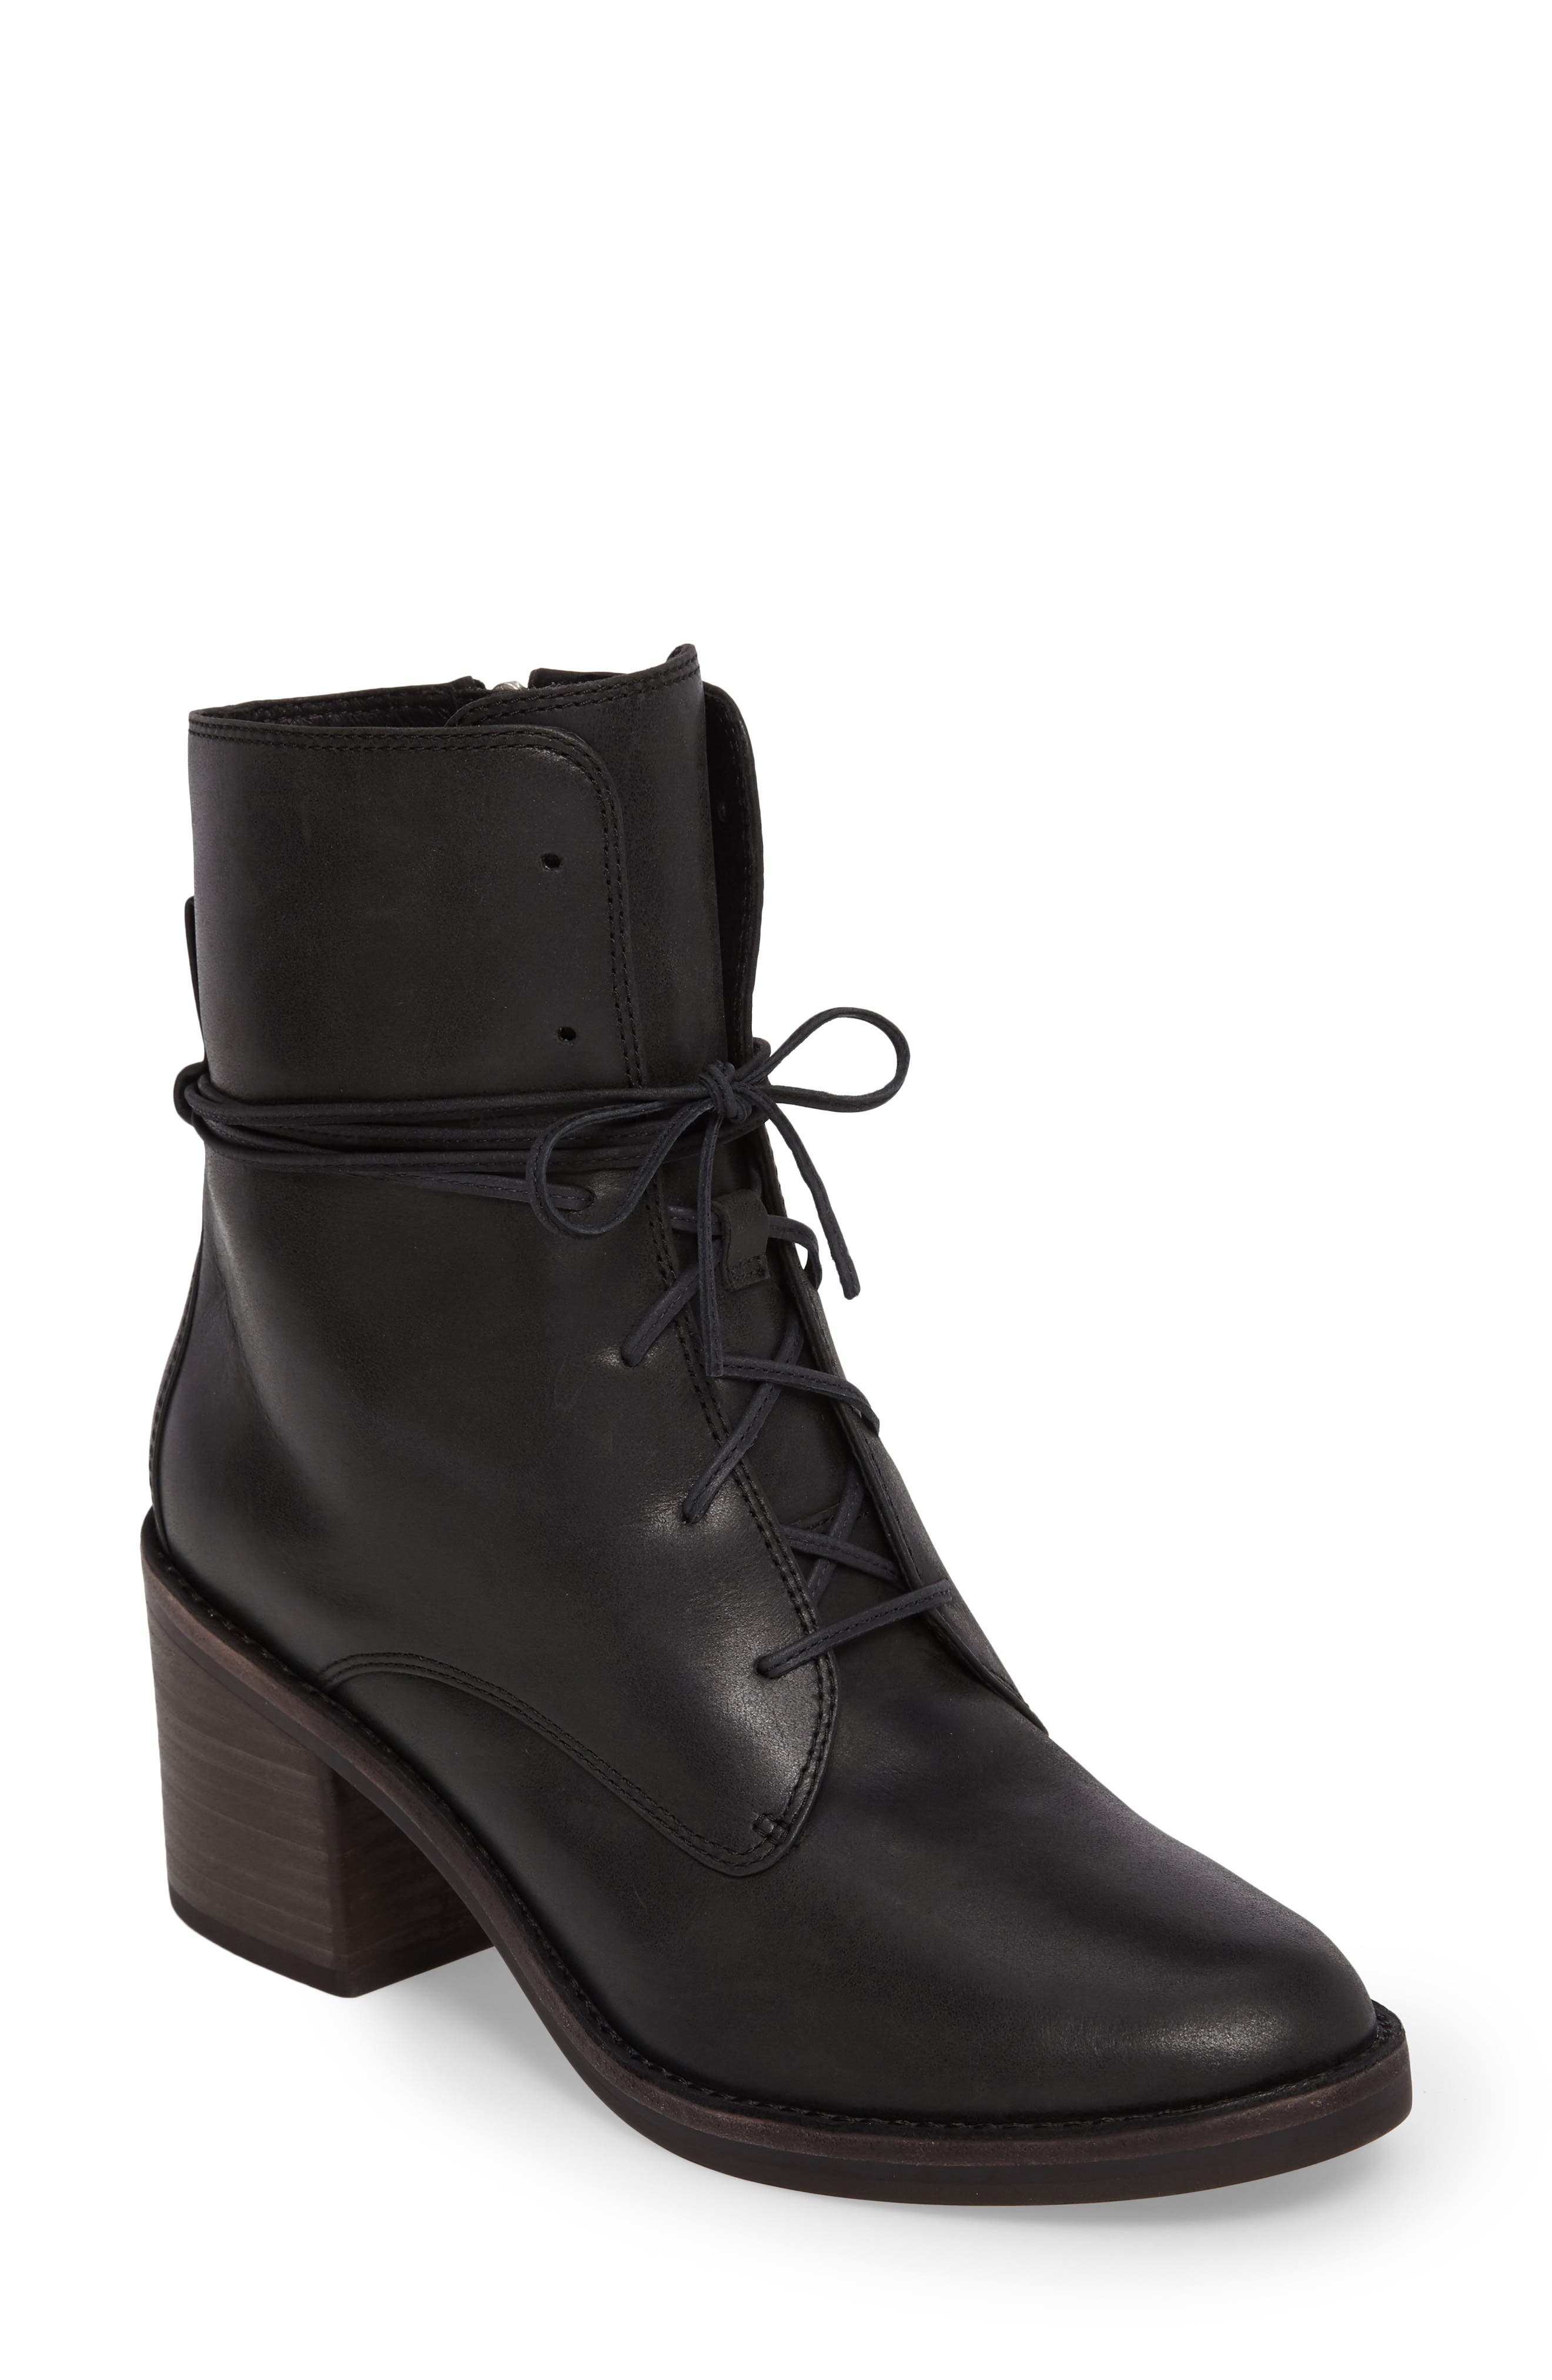 Main Image - UGG® Oriana Lace-Up Boot (Women)